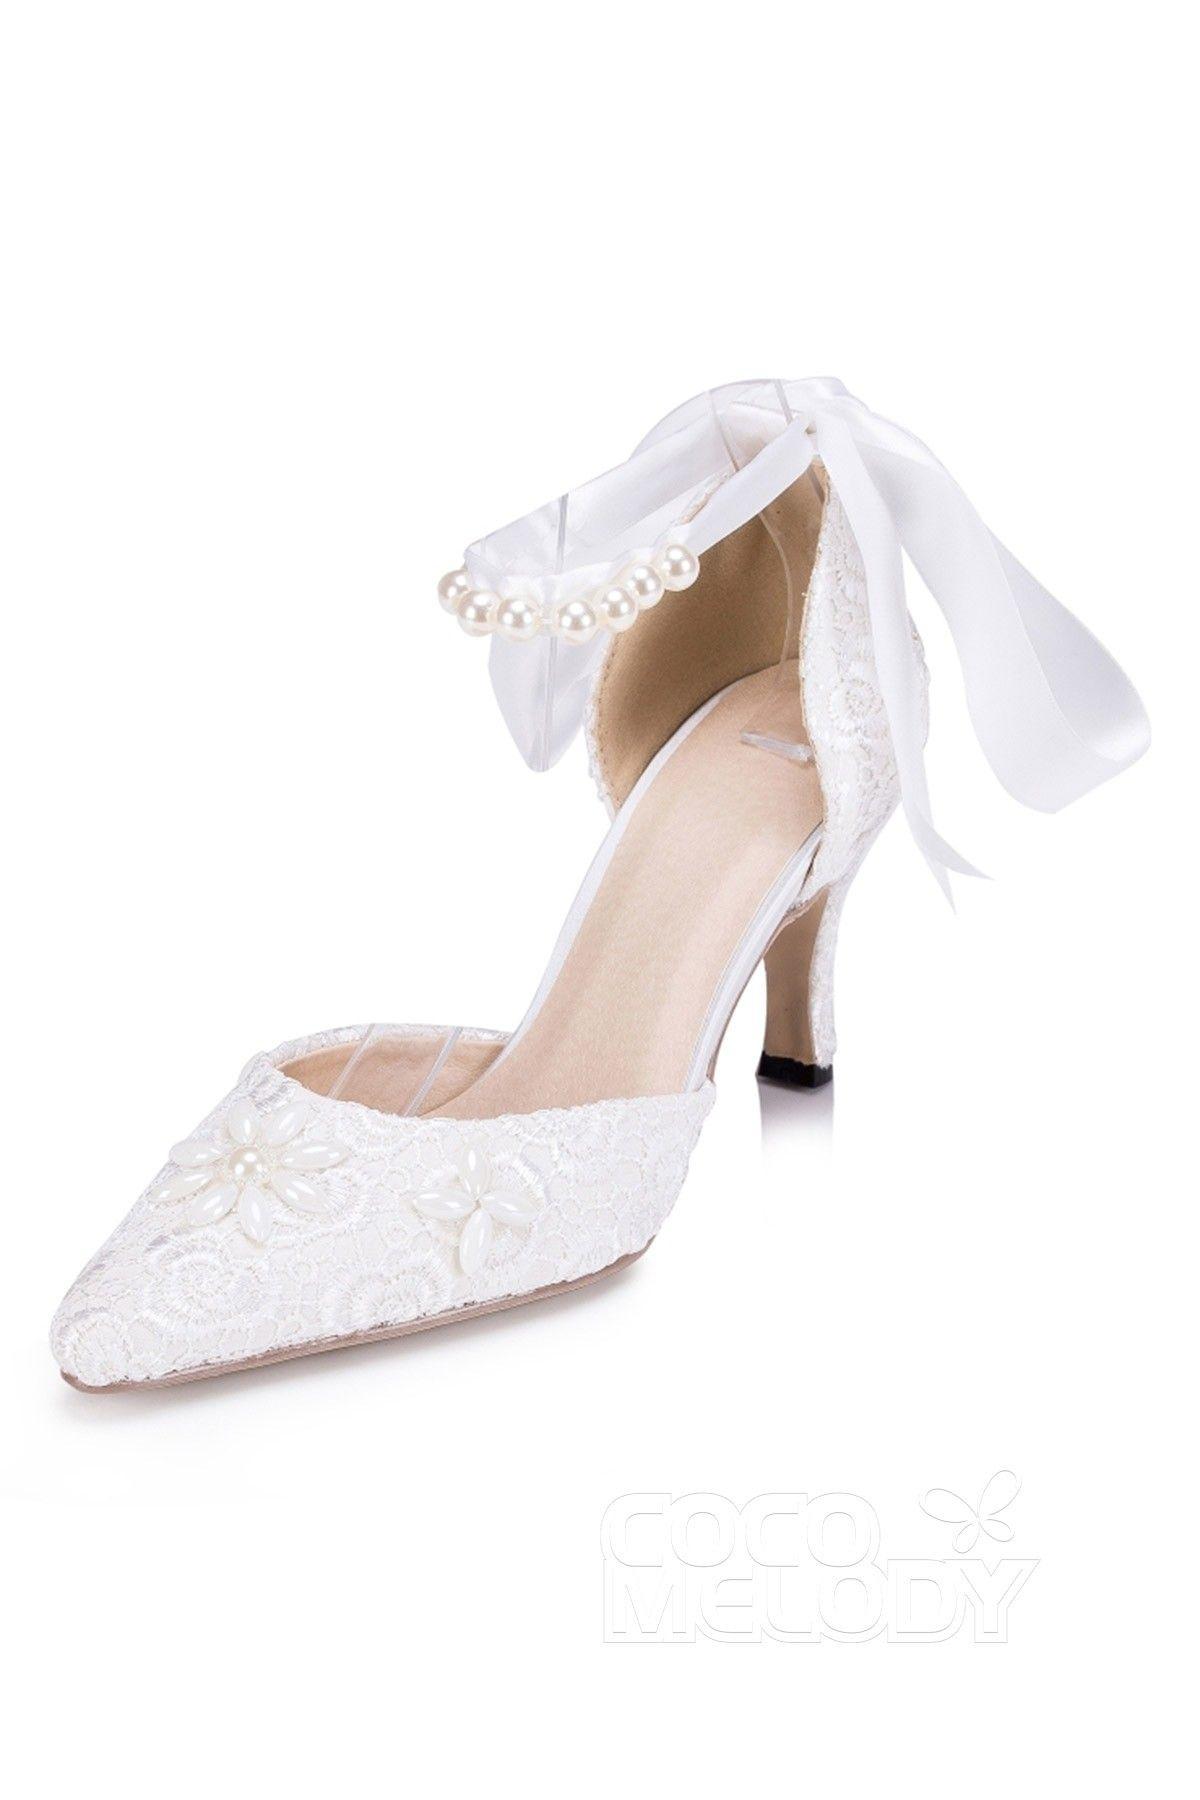 69ebe207ae65 Stiletto Heel 7.5cm Heel Lace Imitation Pearl Mary Jane Bridal Shoes  SWS16055  weddingshoes